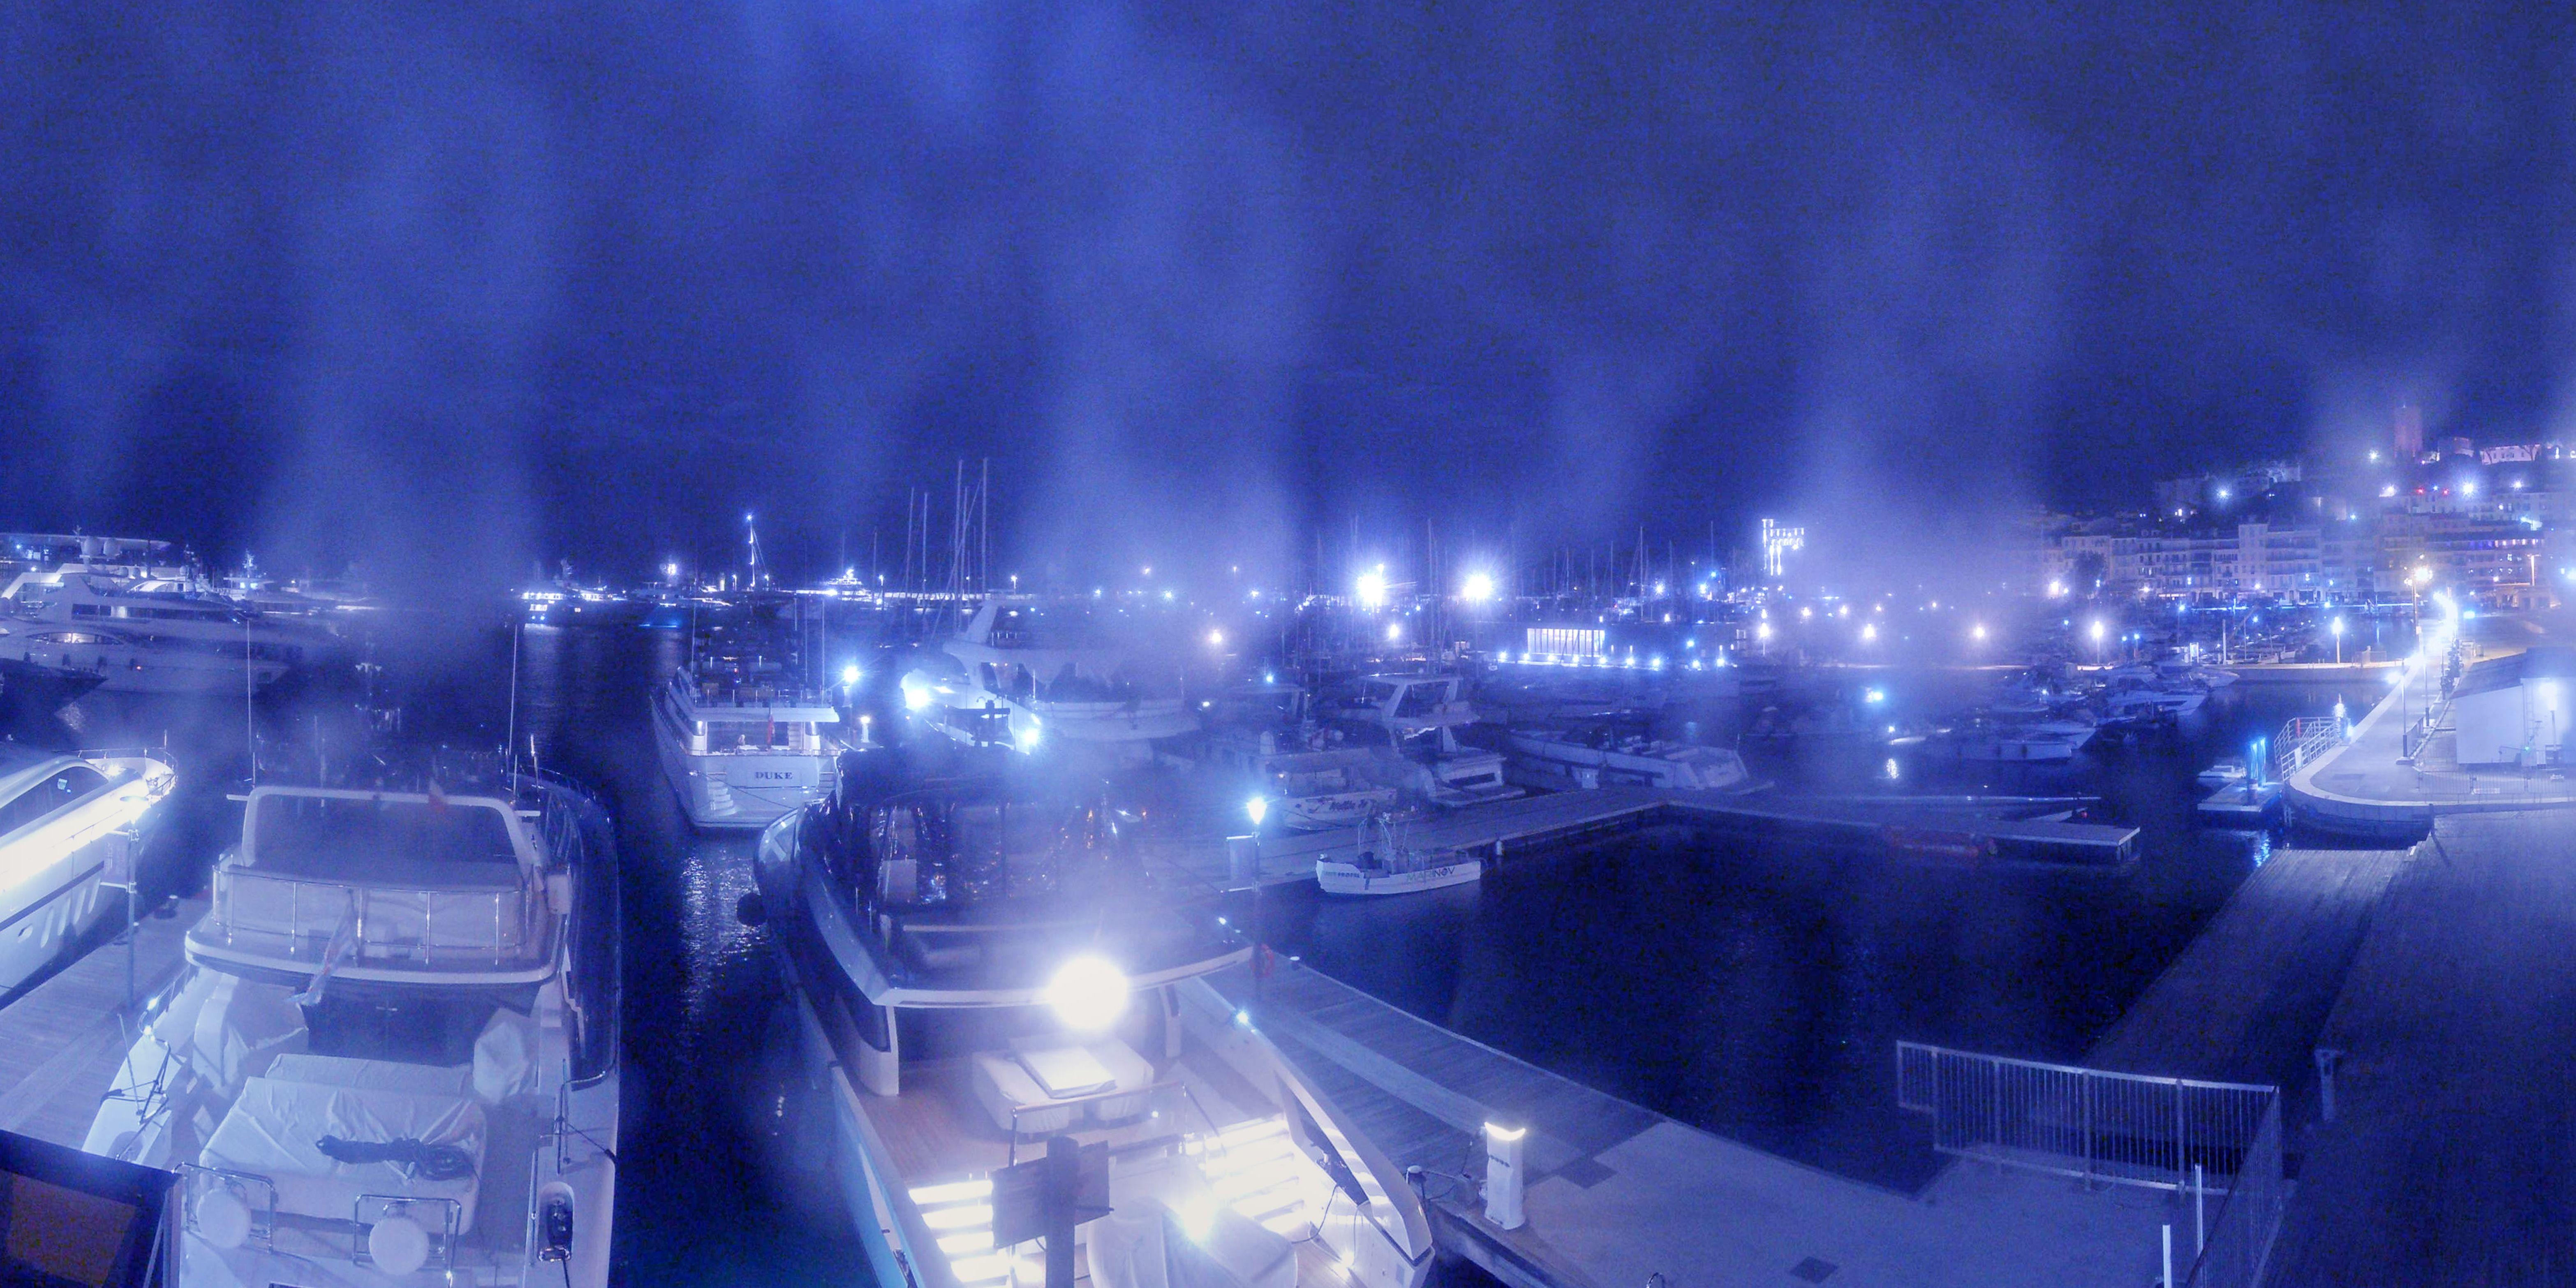 Cannes Thu. 05:35